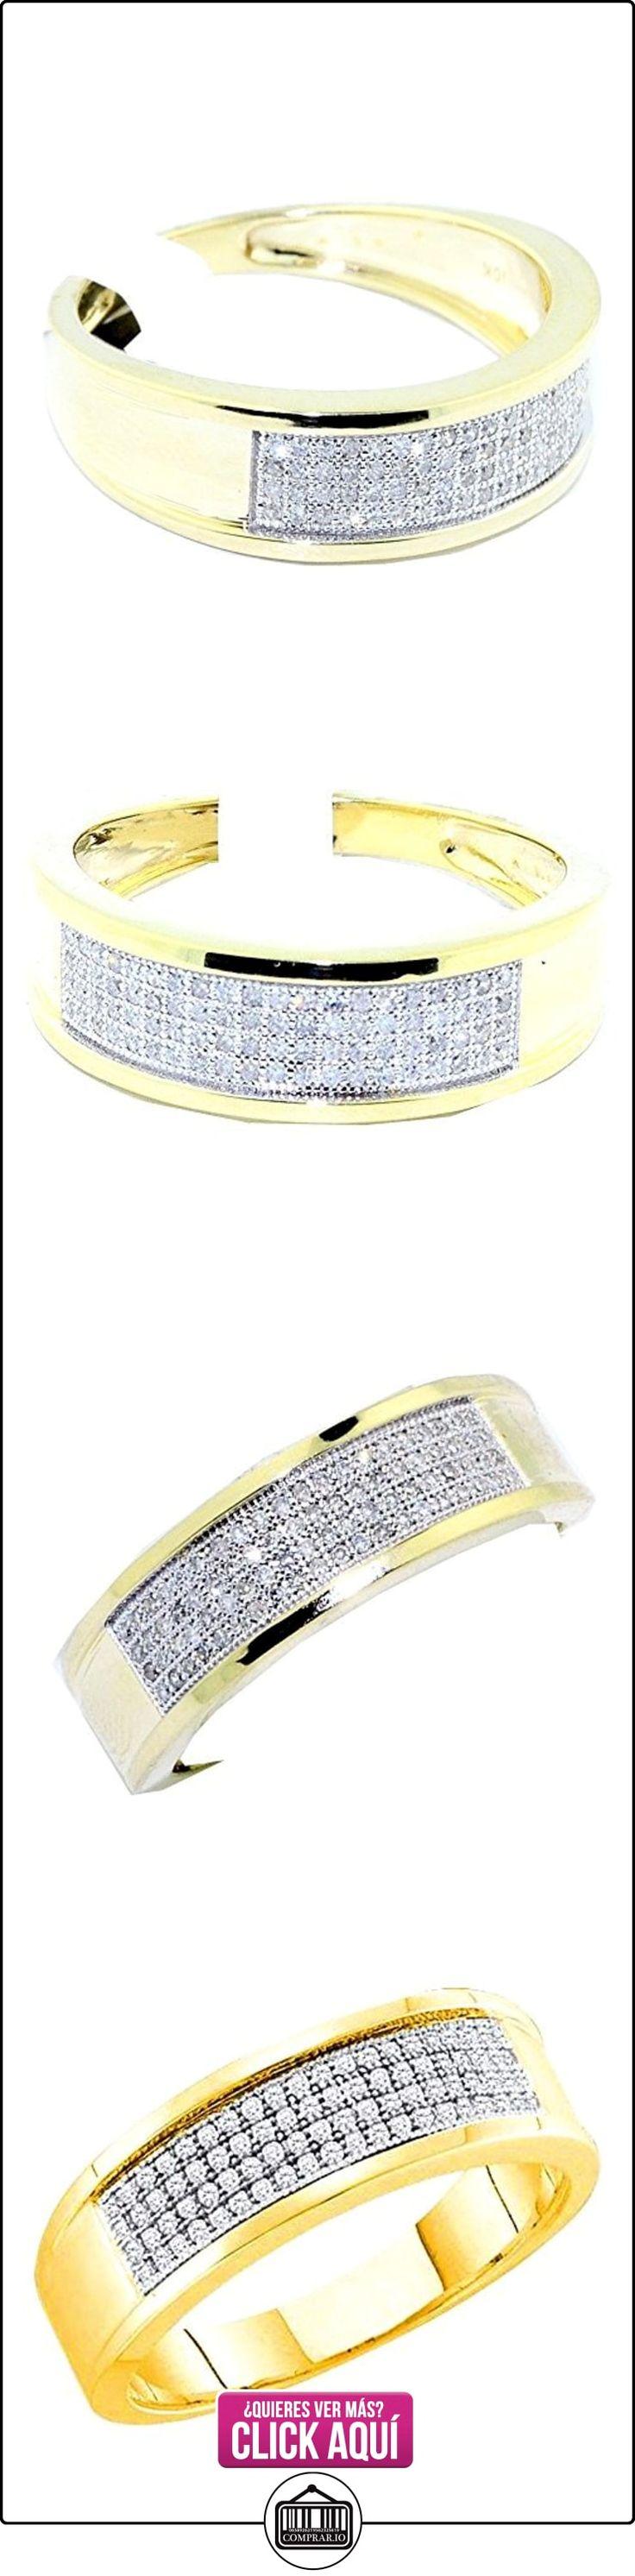 rings-midwestjewellery. com Hombre 1/4cttw Anillo de banda de bodas de diamante 10K oro amarillo 7mm de ancho (I/J Color 0,25quilates)  ✿ Joyas para hombres especiales - lujo ✿ ▬► Ver oferta: https://comprar.io/goto/B00WNKK18Q